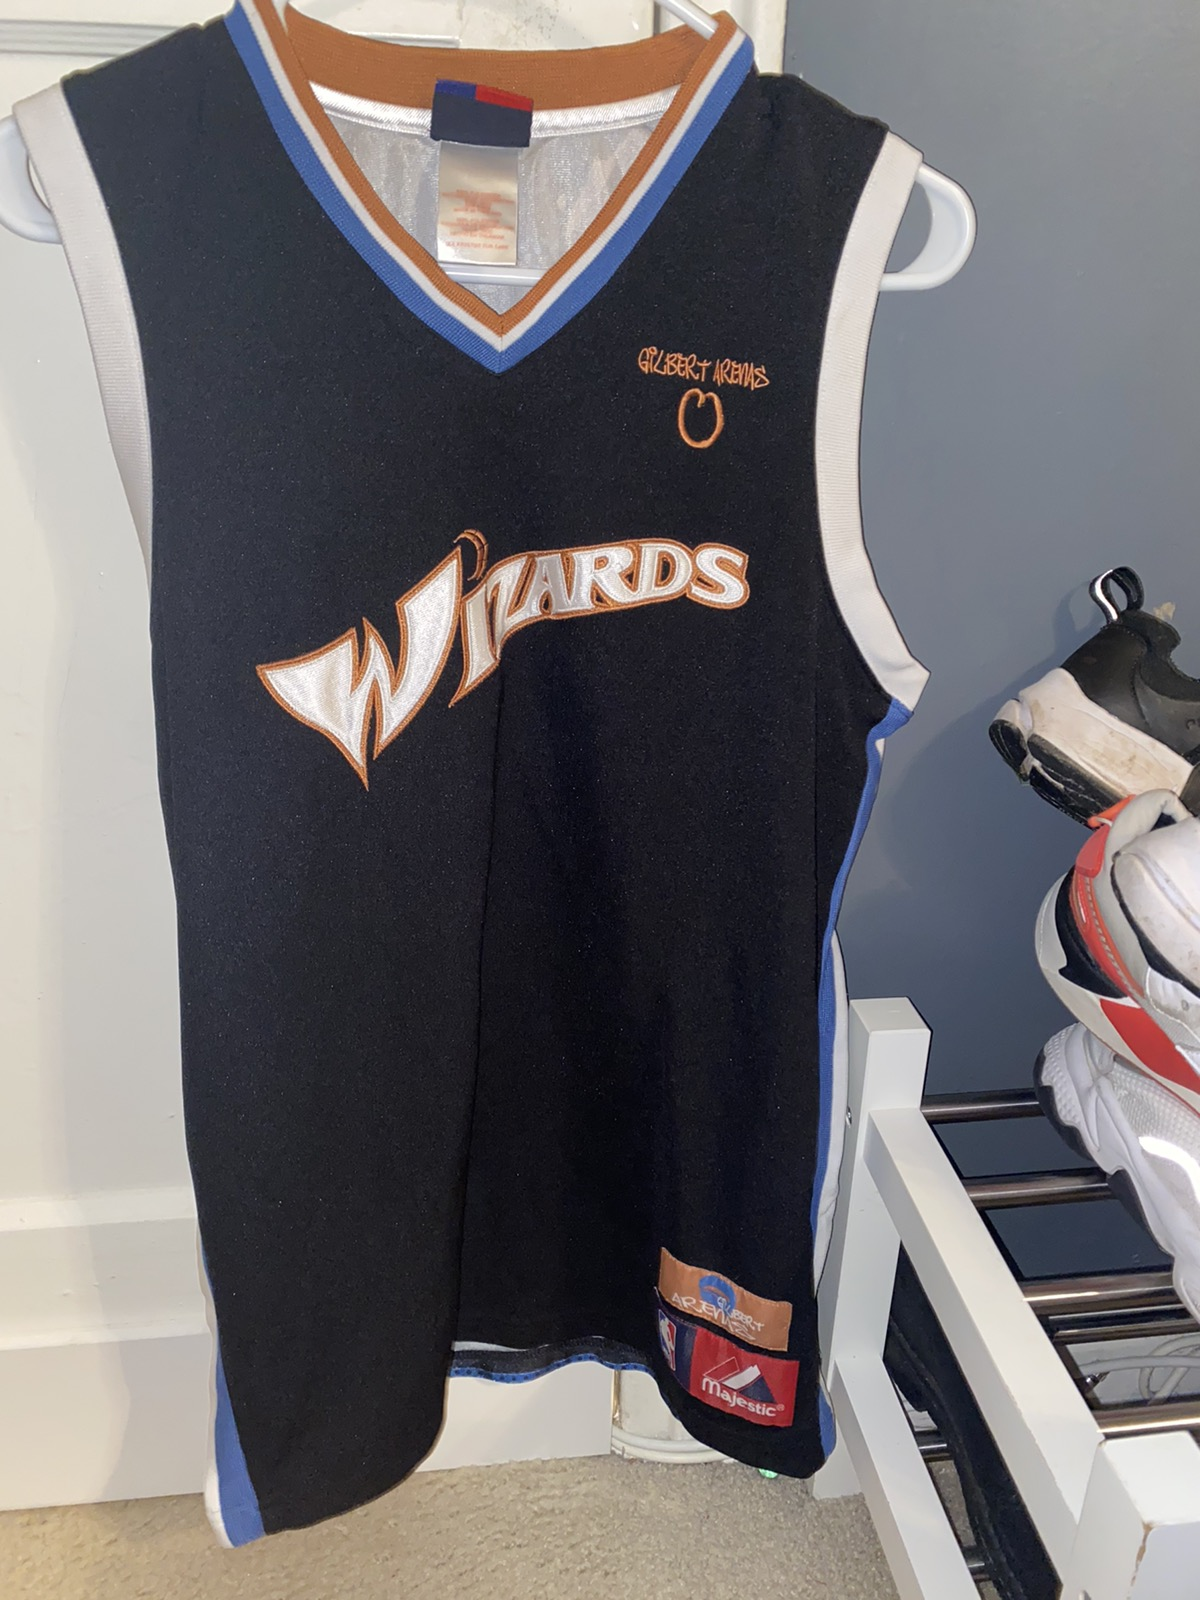 arenas jersey